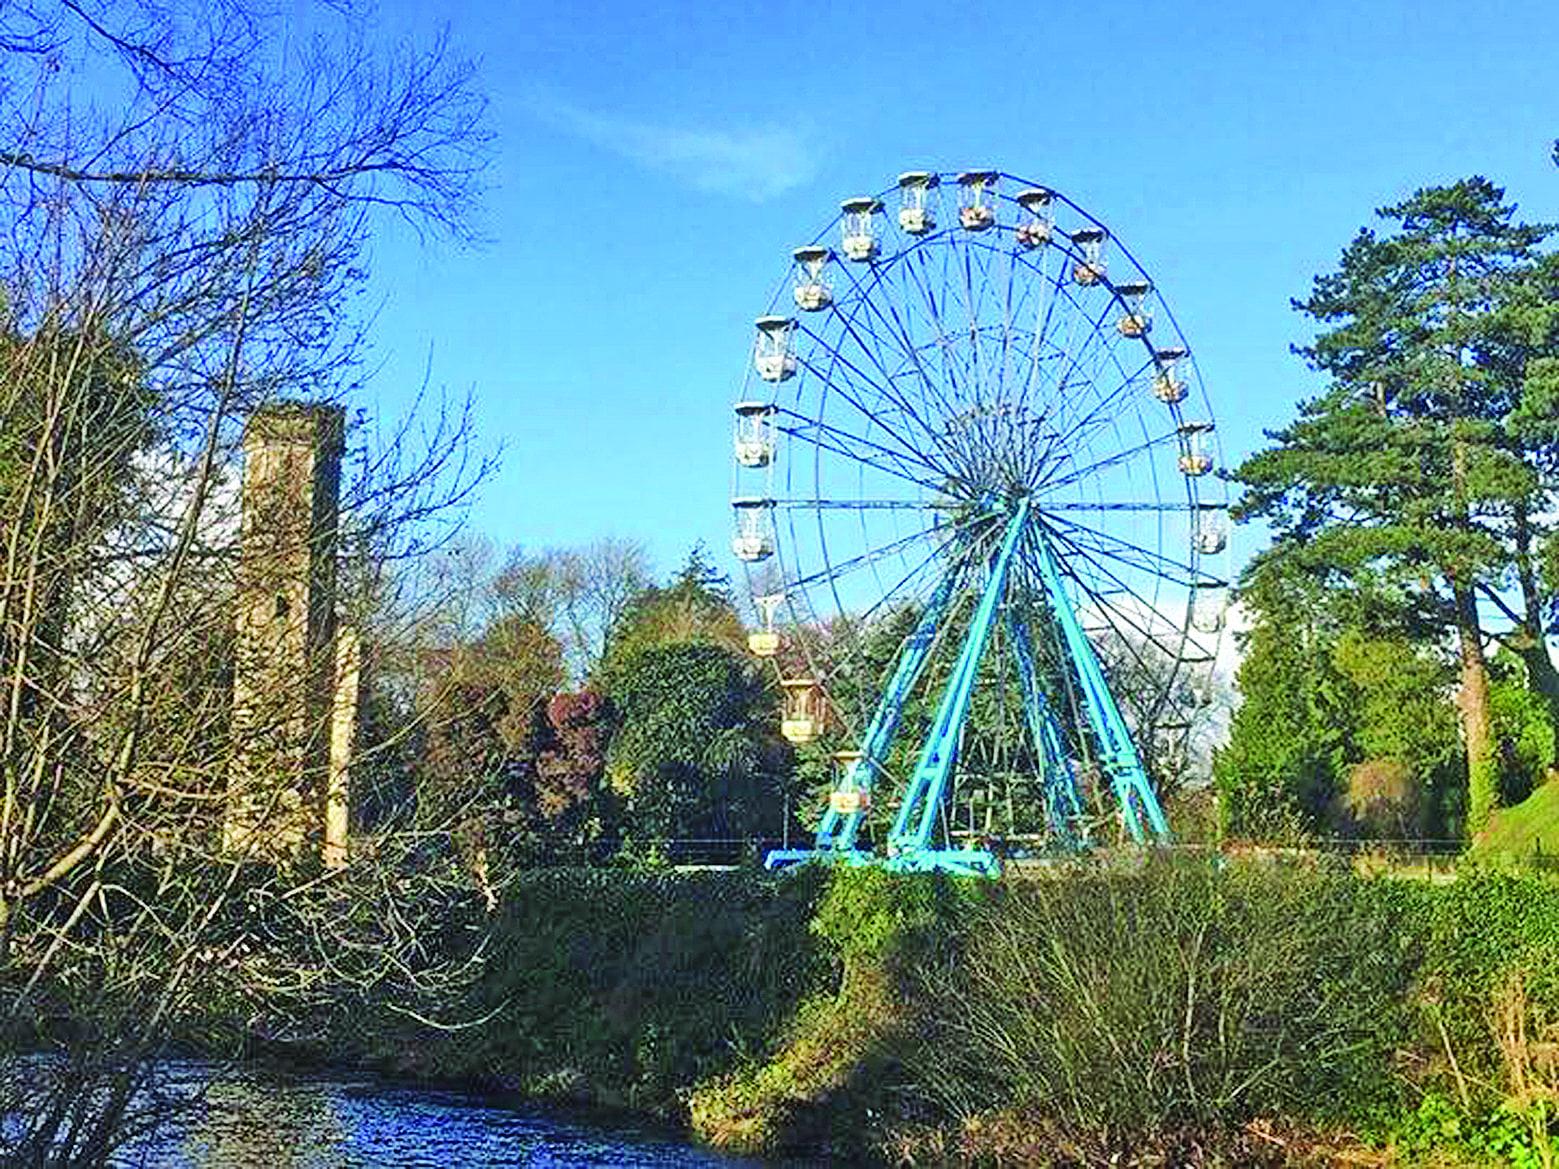 Big wheel coming – Bangor's next big attraction?